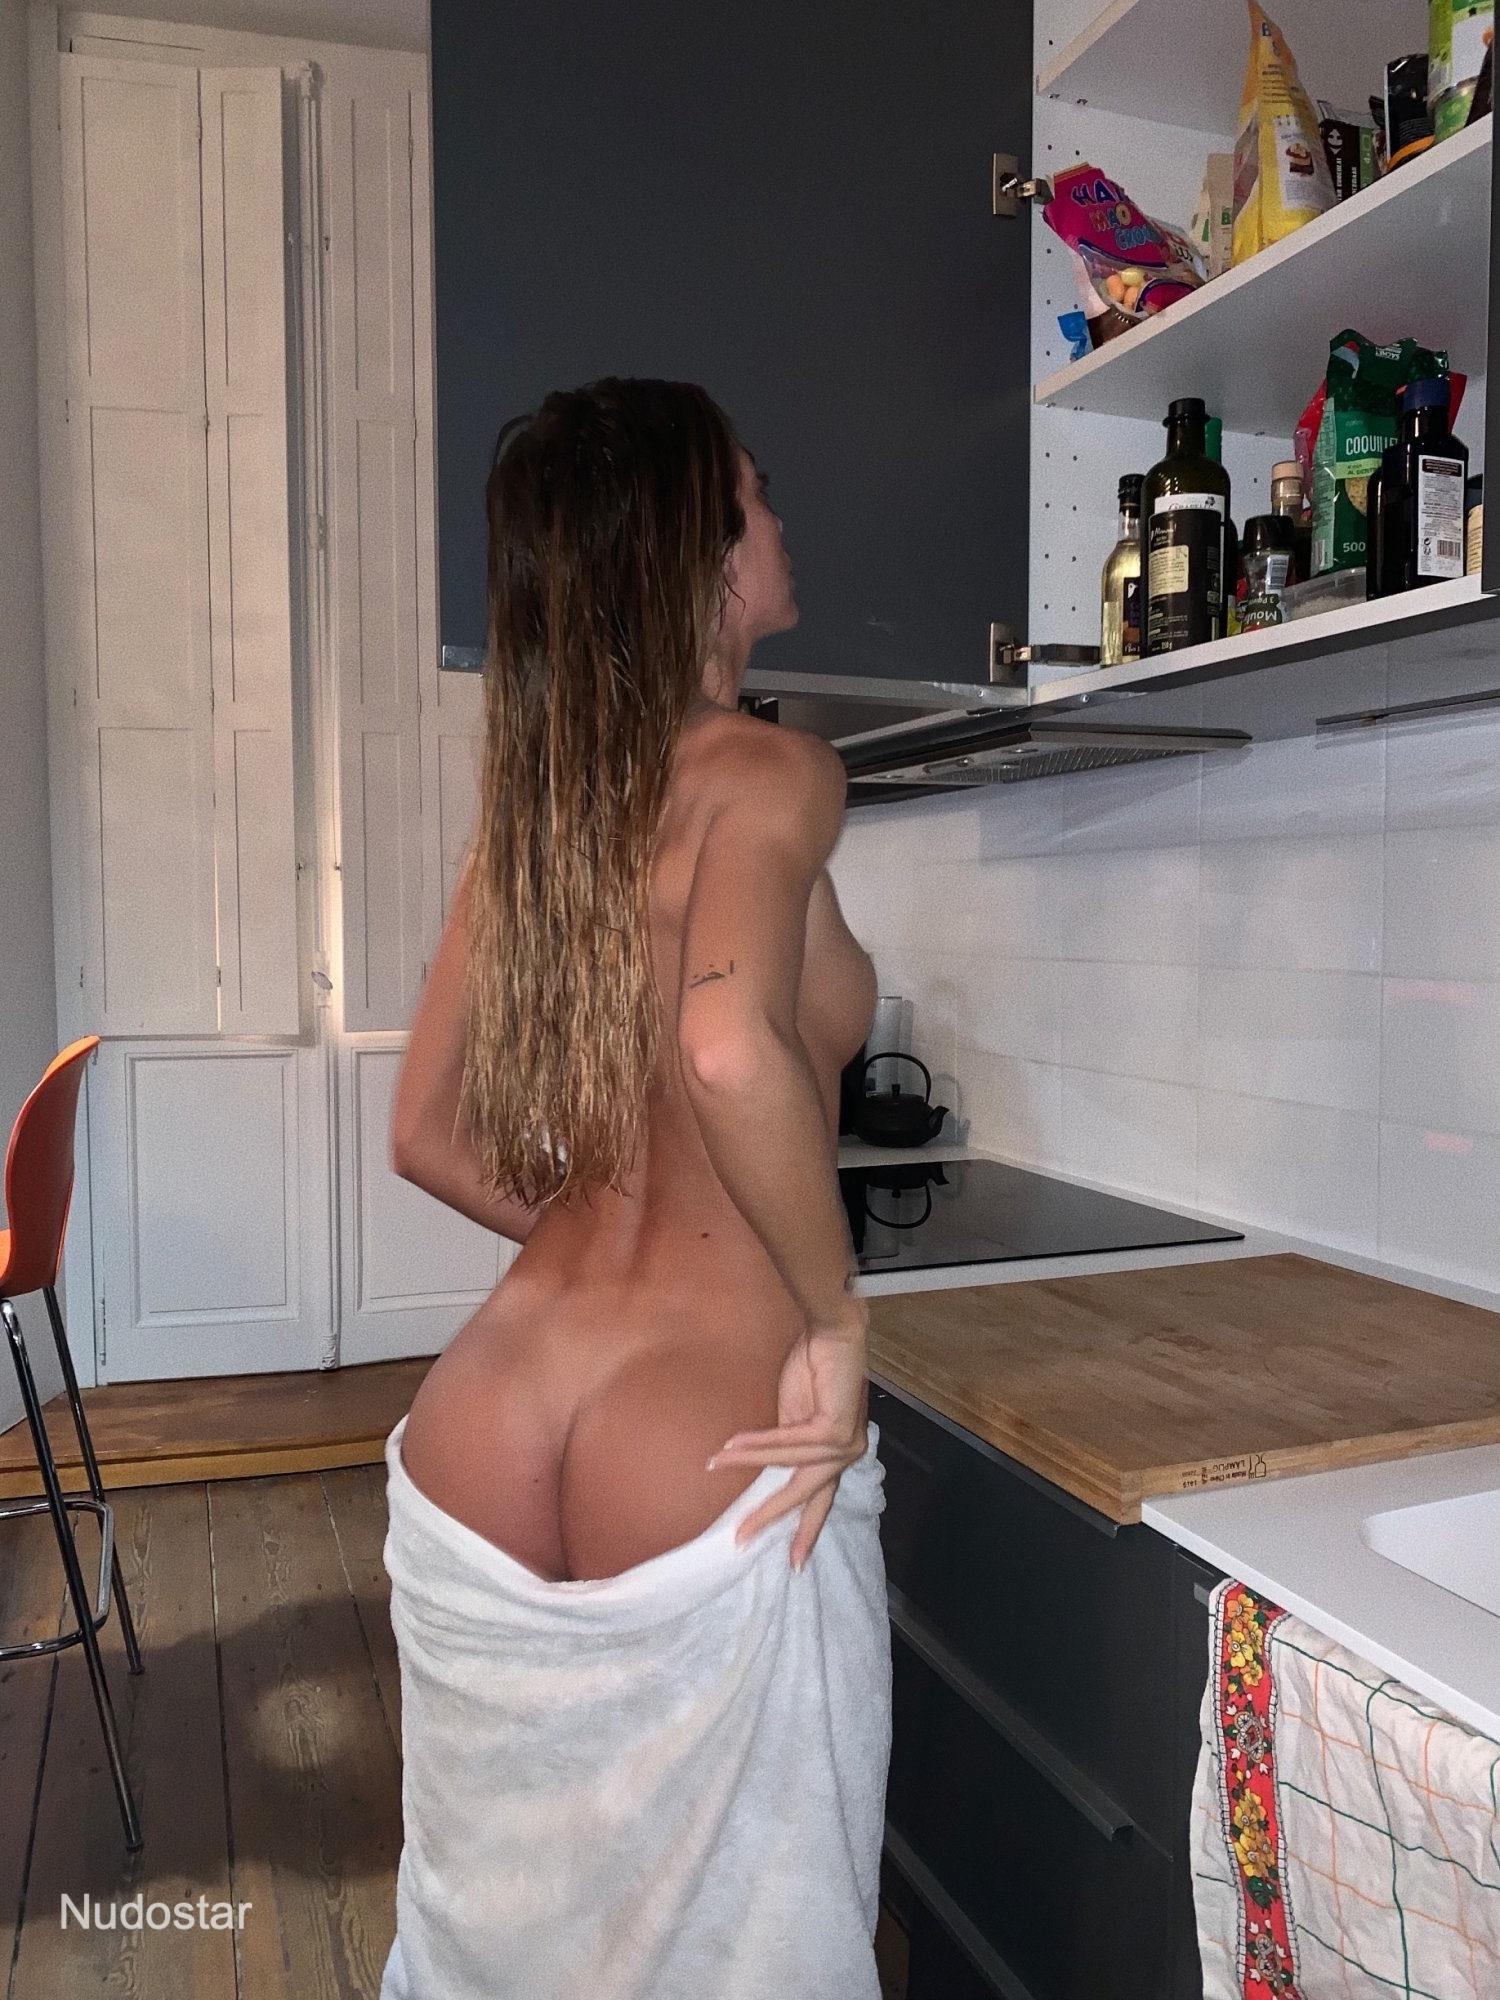 Popstantot Mym.fans Nudes Leaks 0027